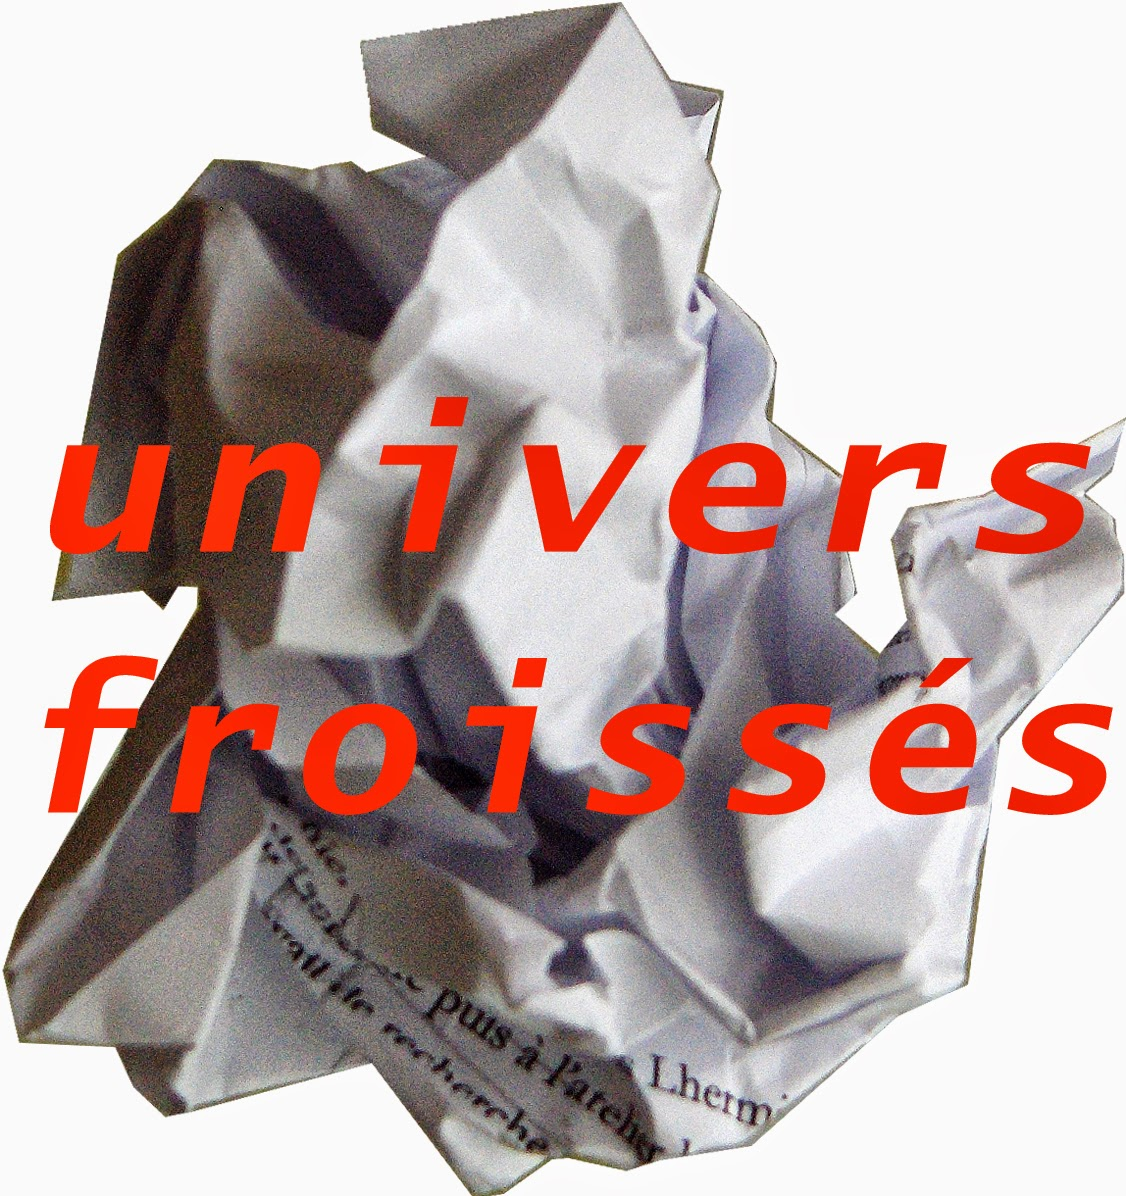 http://voisimages.blogspot.fr/p/blog-page_13.html